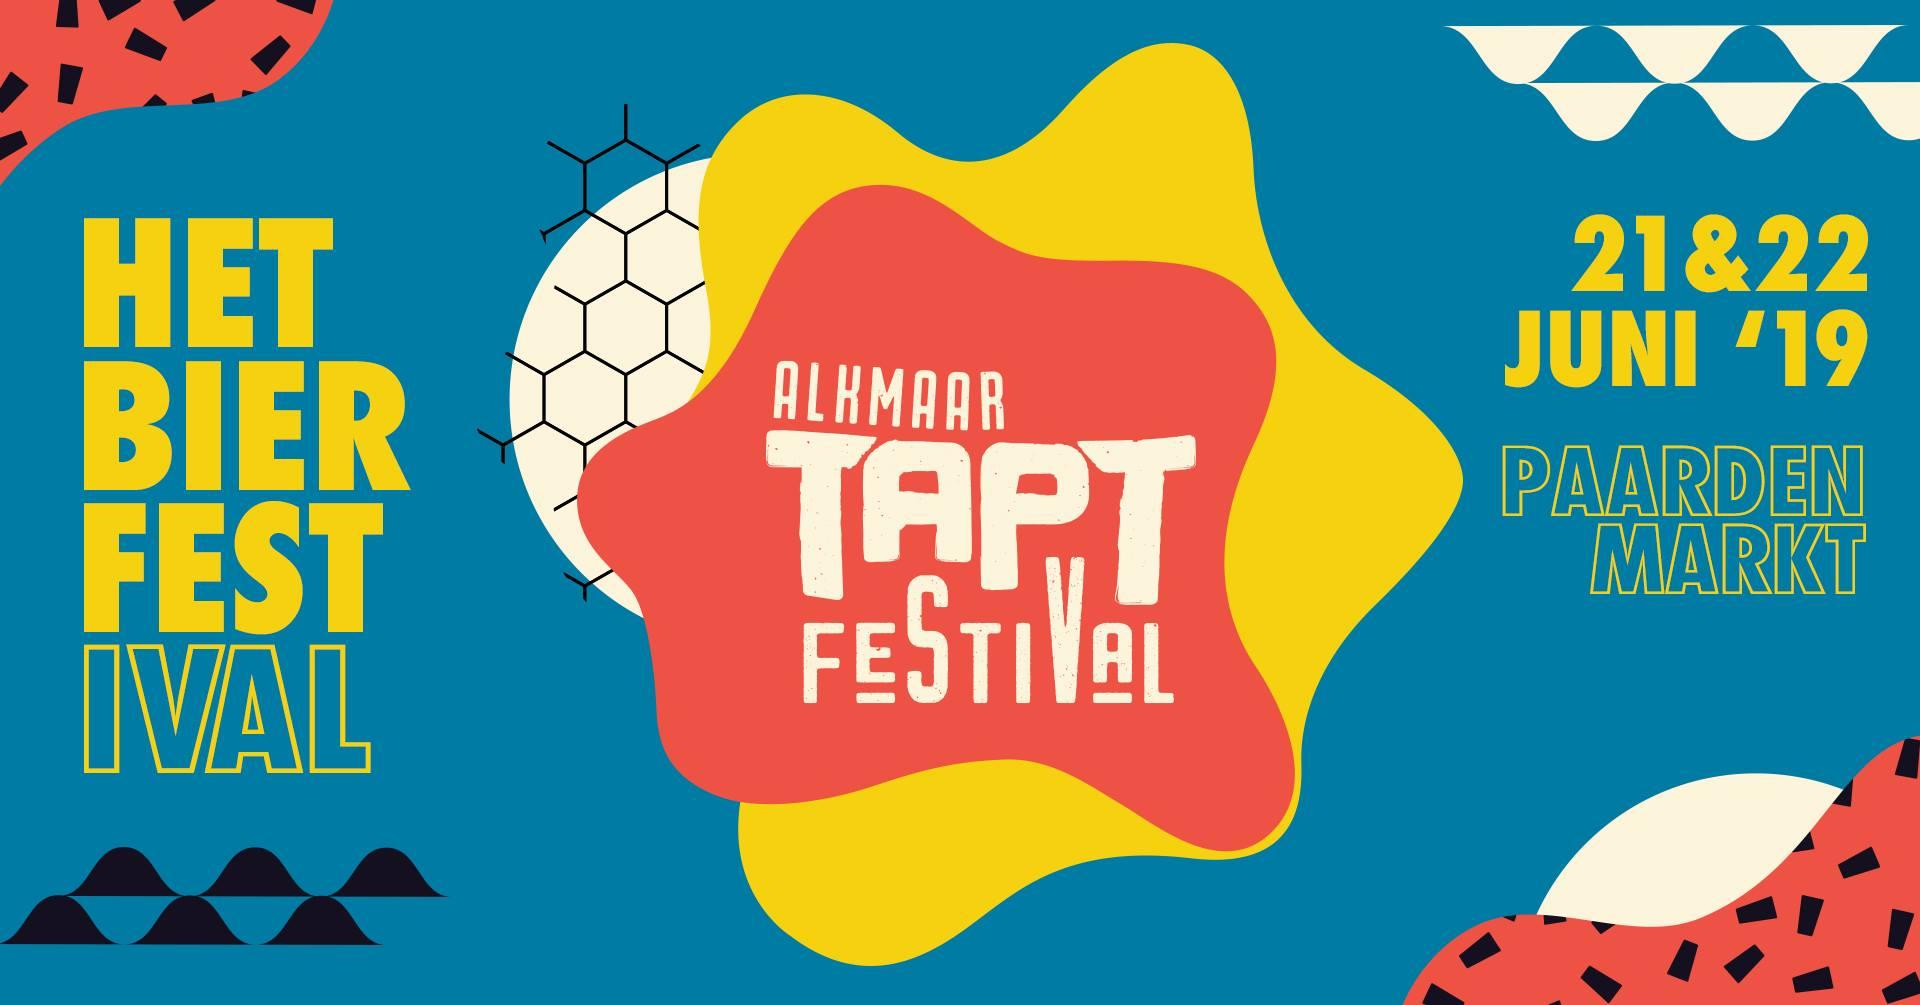 Alkmaar TAPT 2019